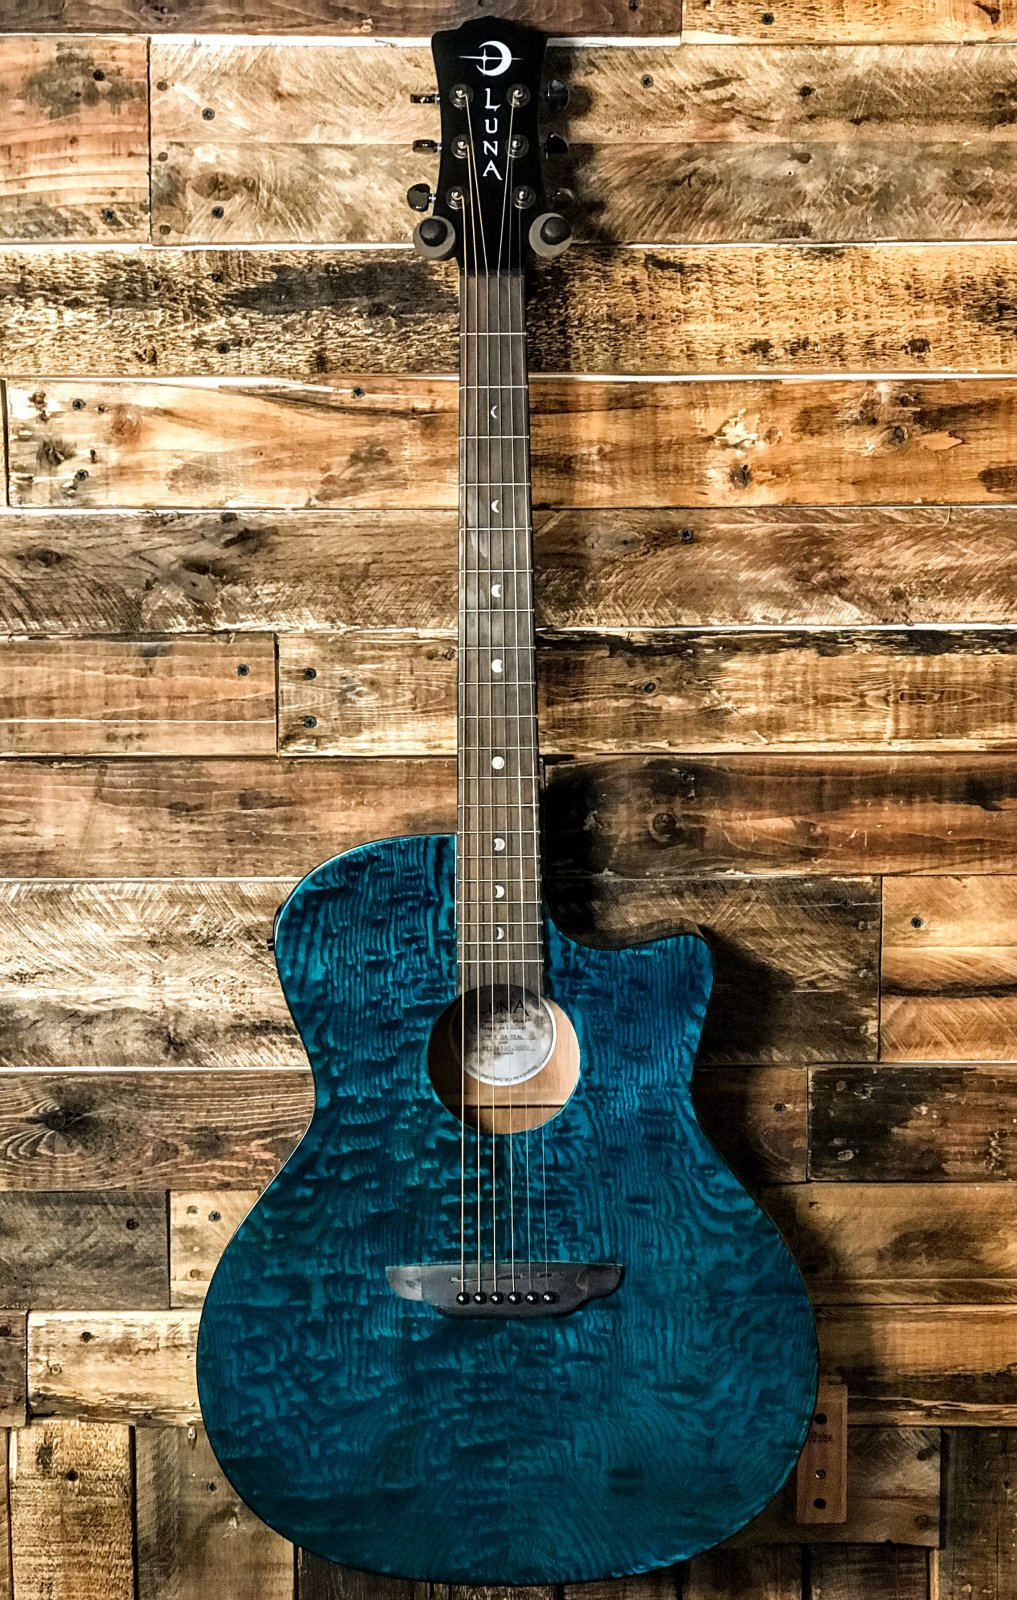 Luna GYPQAATEAL Acoustic Electric Guitar